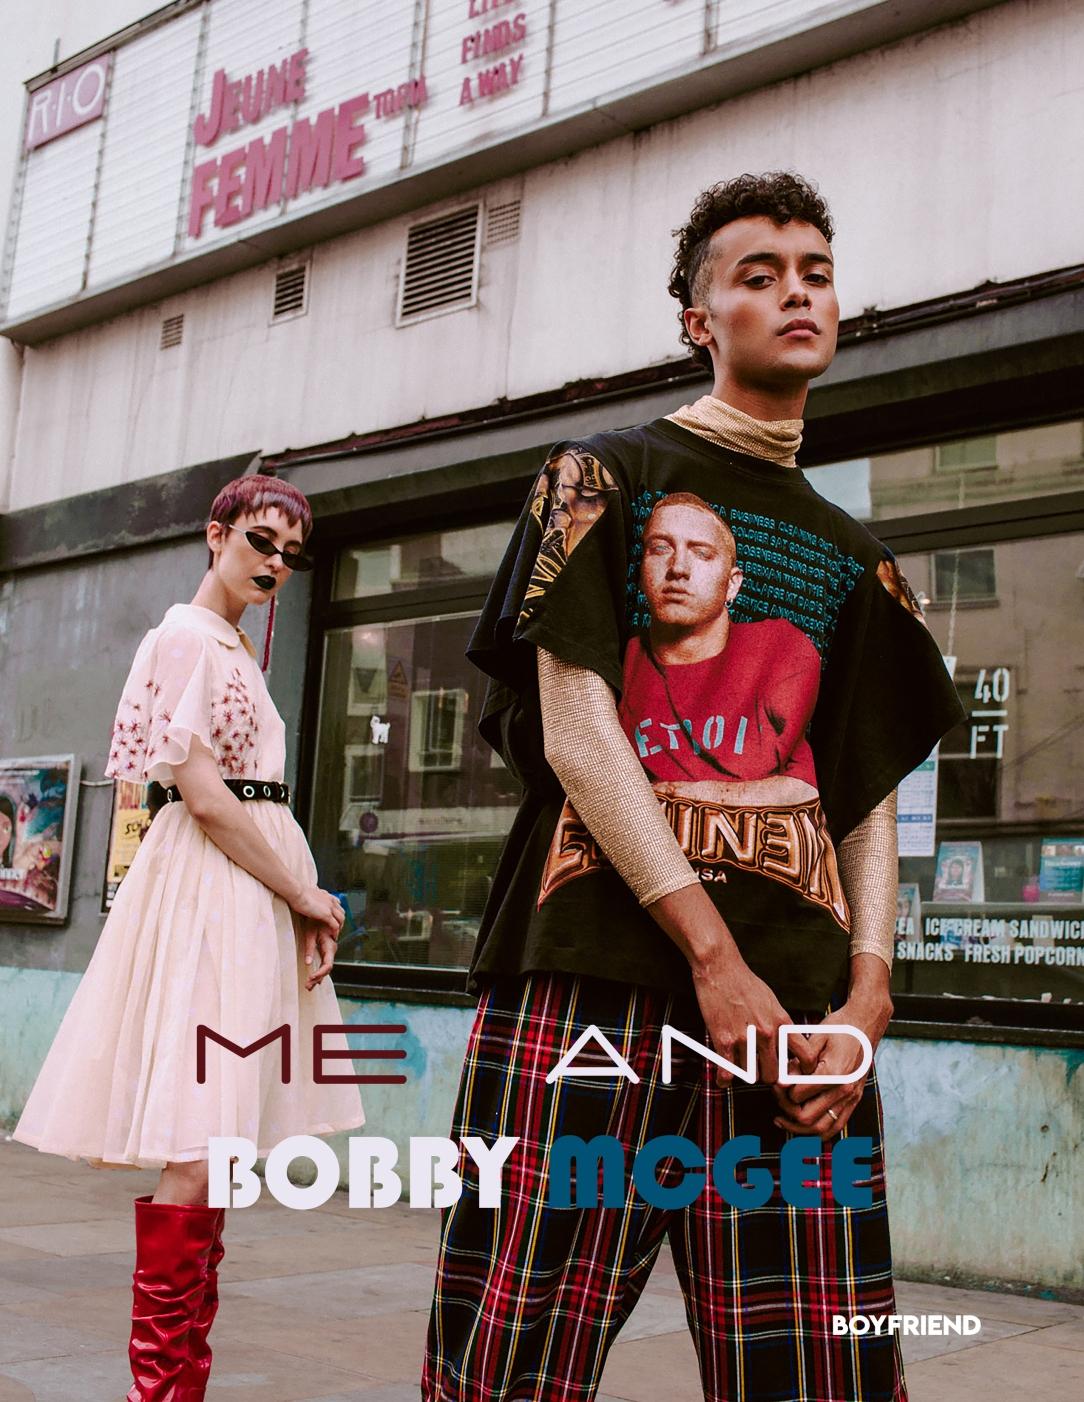 Boyfriend Mag - September 2018 - Me and Bobby McGee